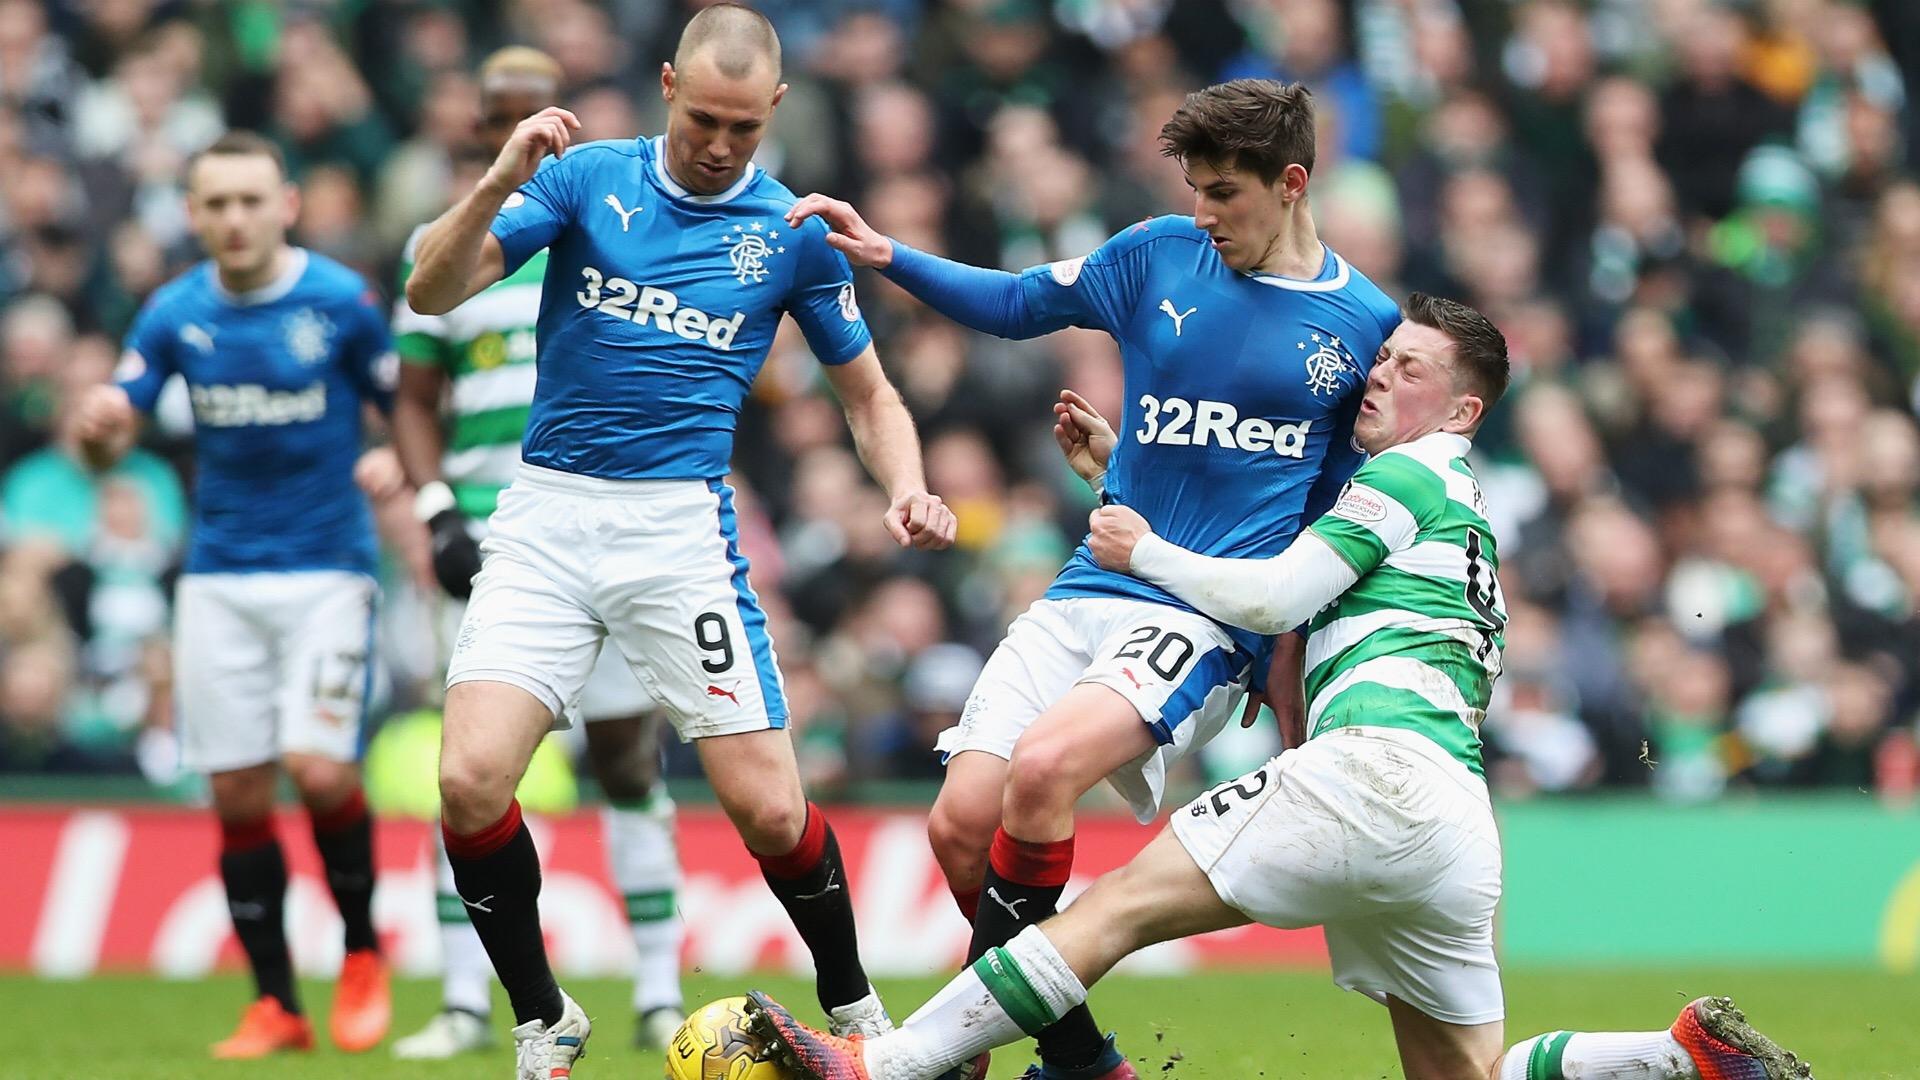 celtic vs rangers - photo #9